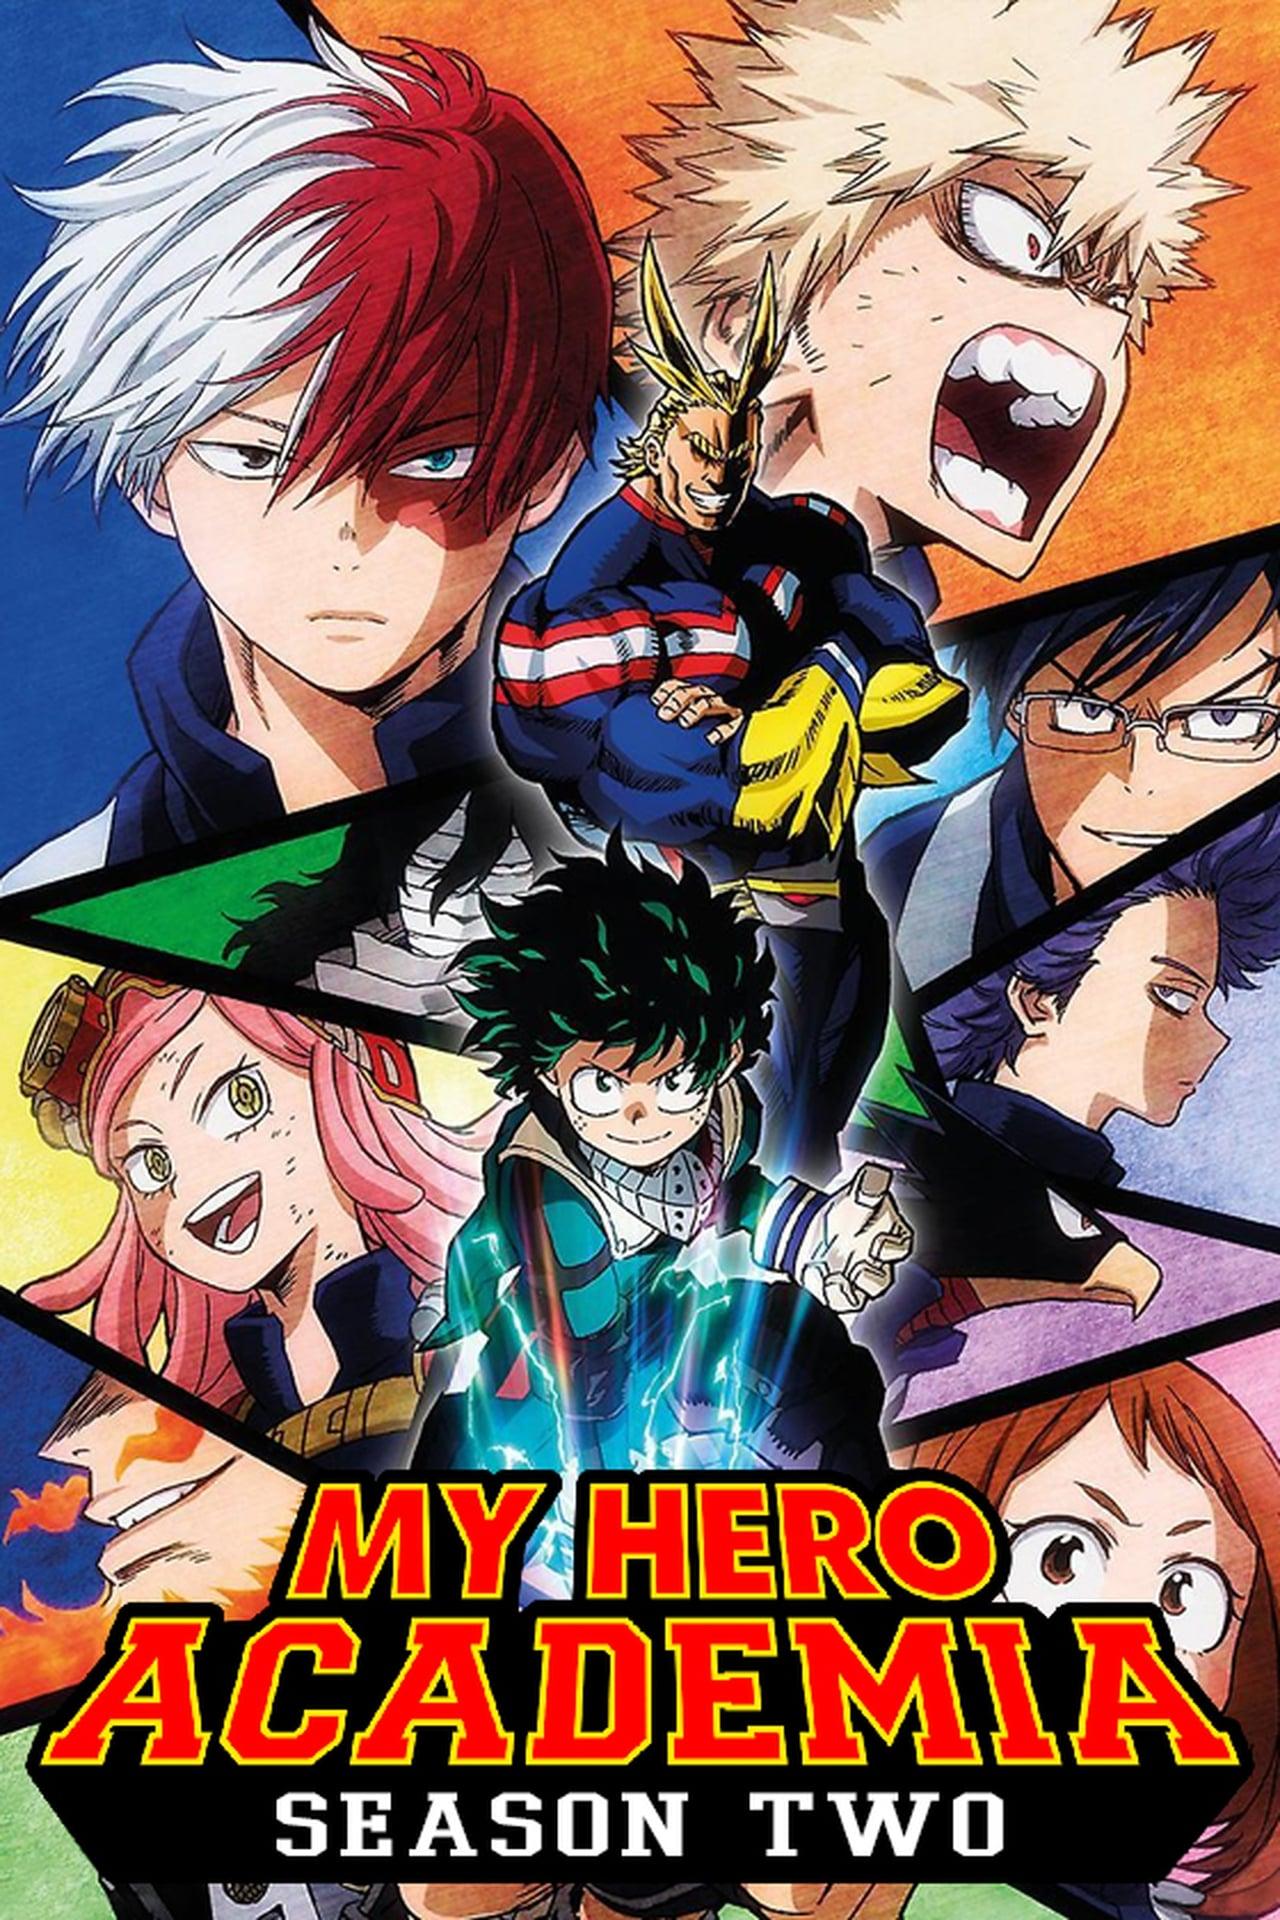 My Hero Academia (2017)